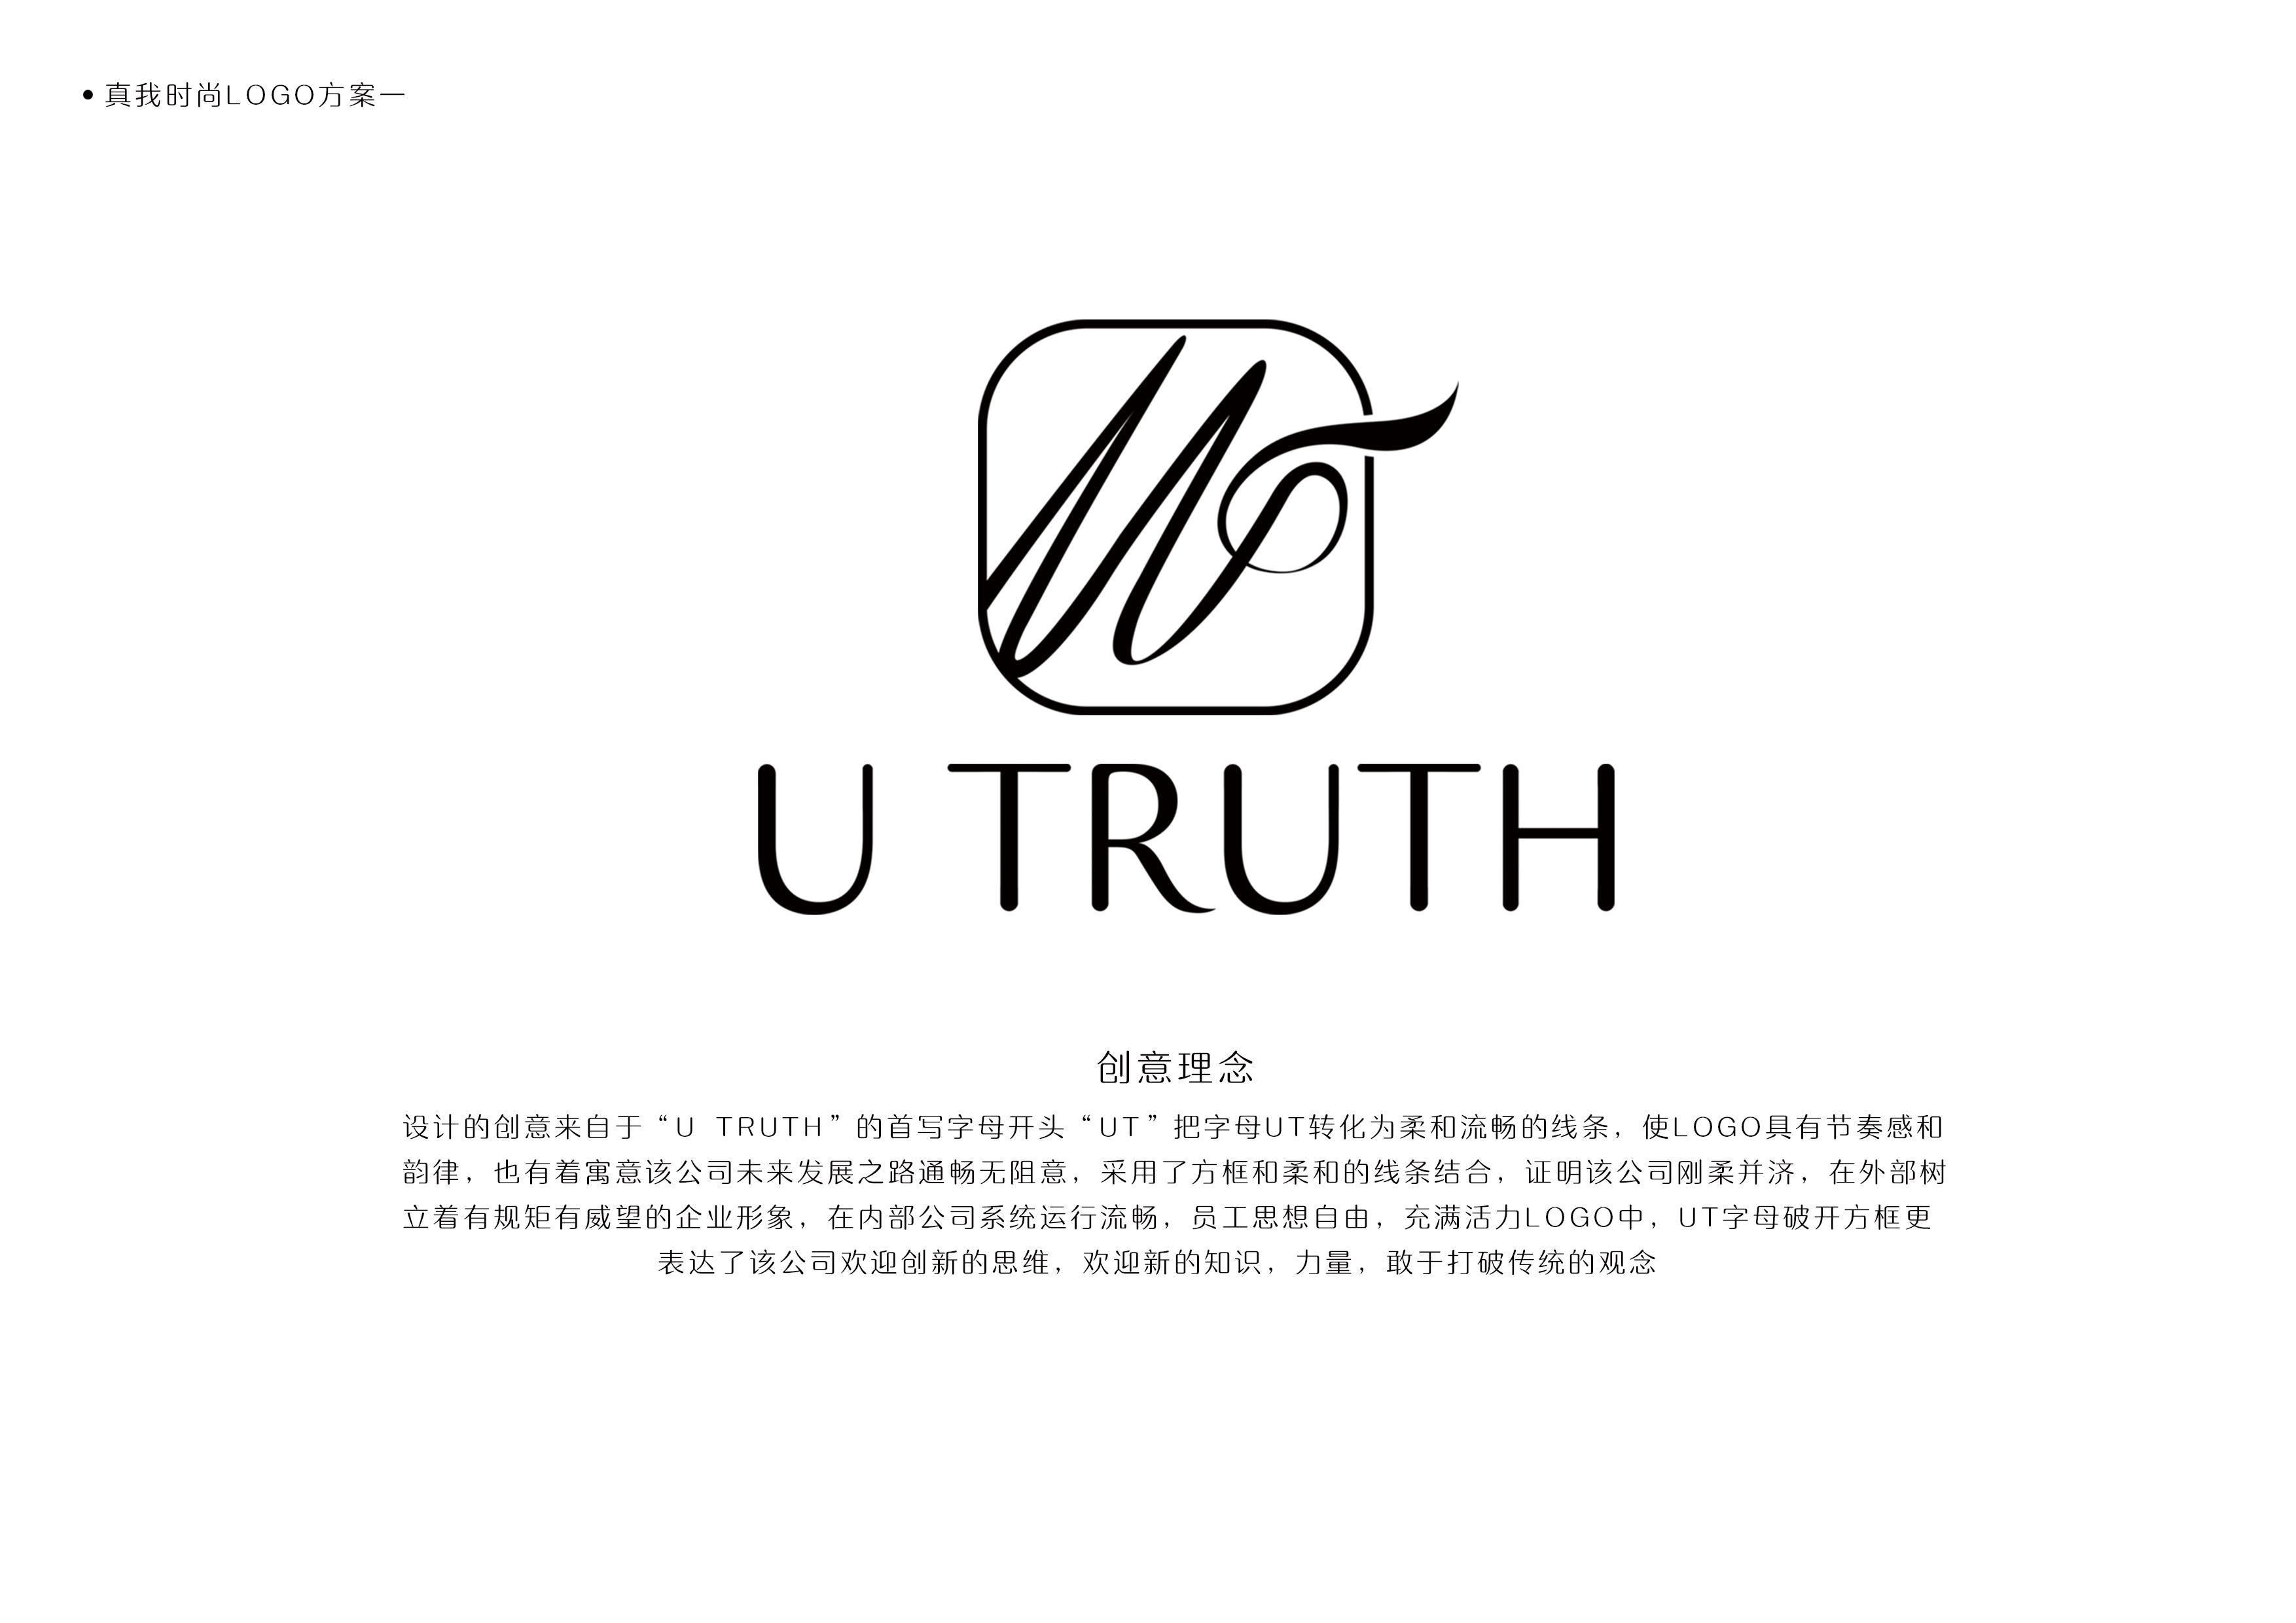 logo妗堜緥